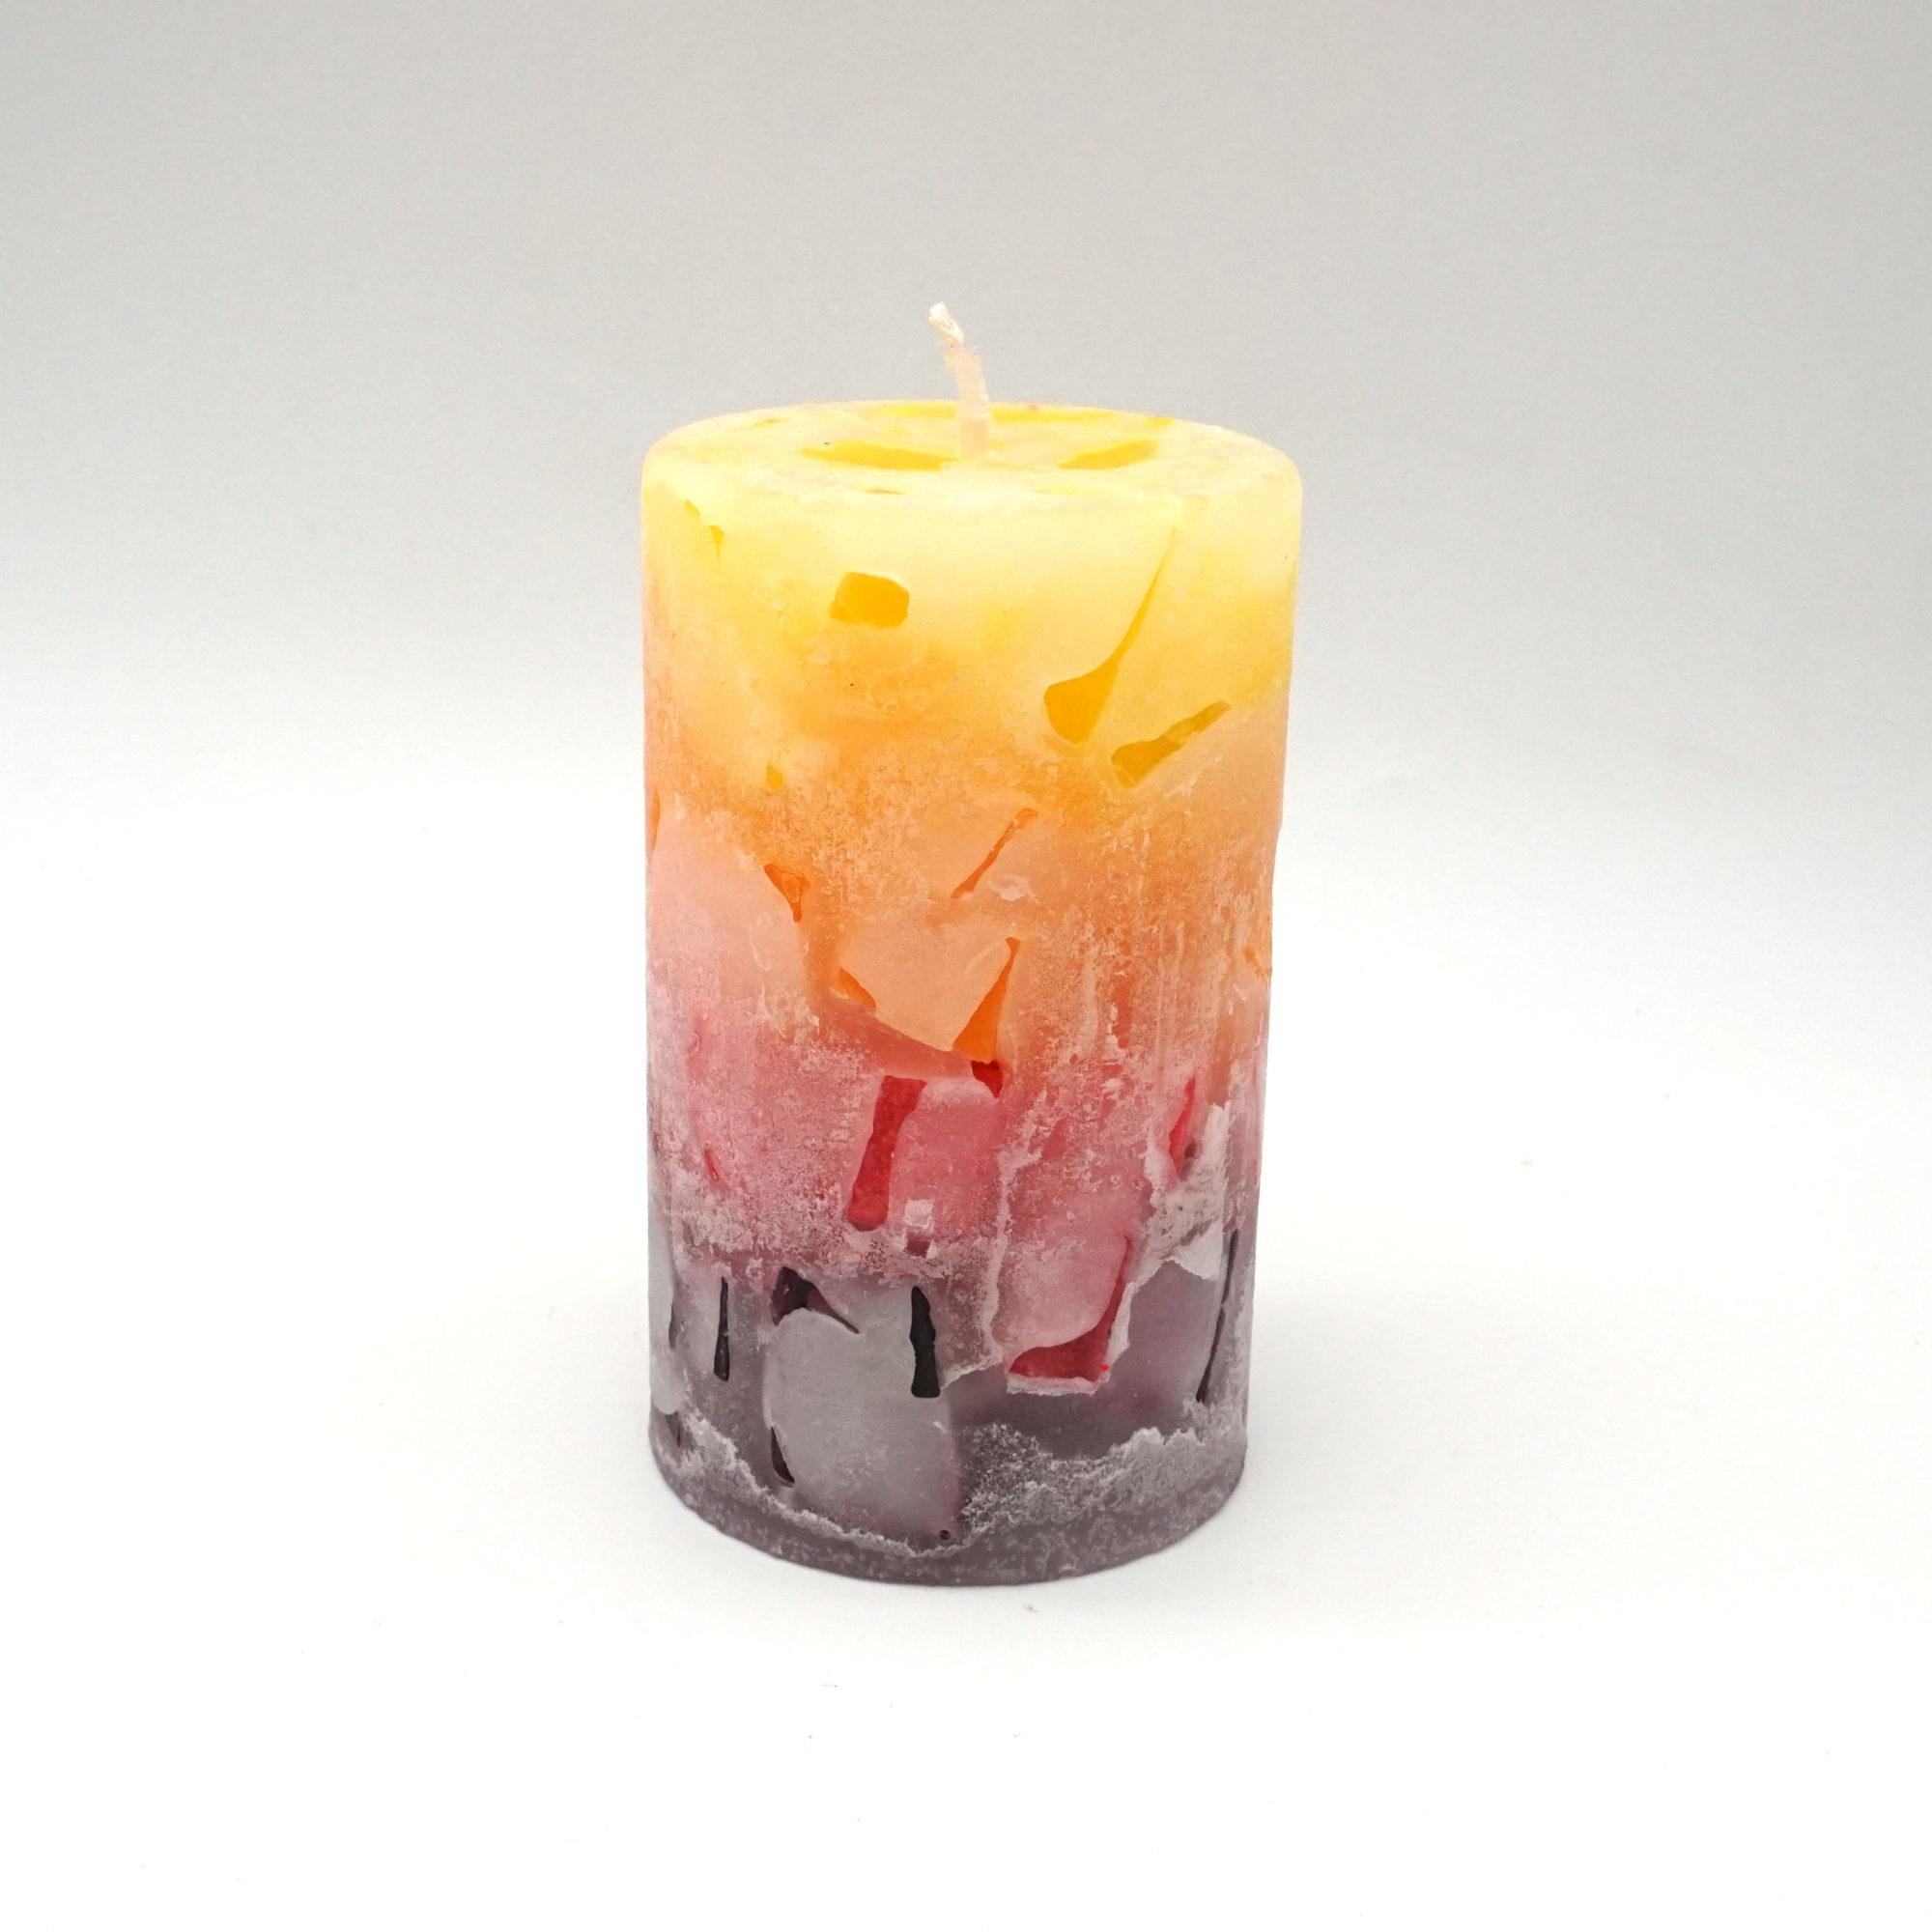 gegossene Cracker Kerze aus dem Bastelset